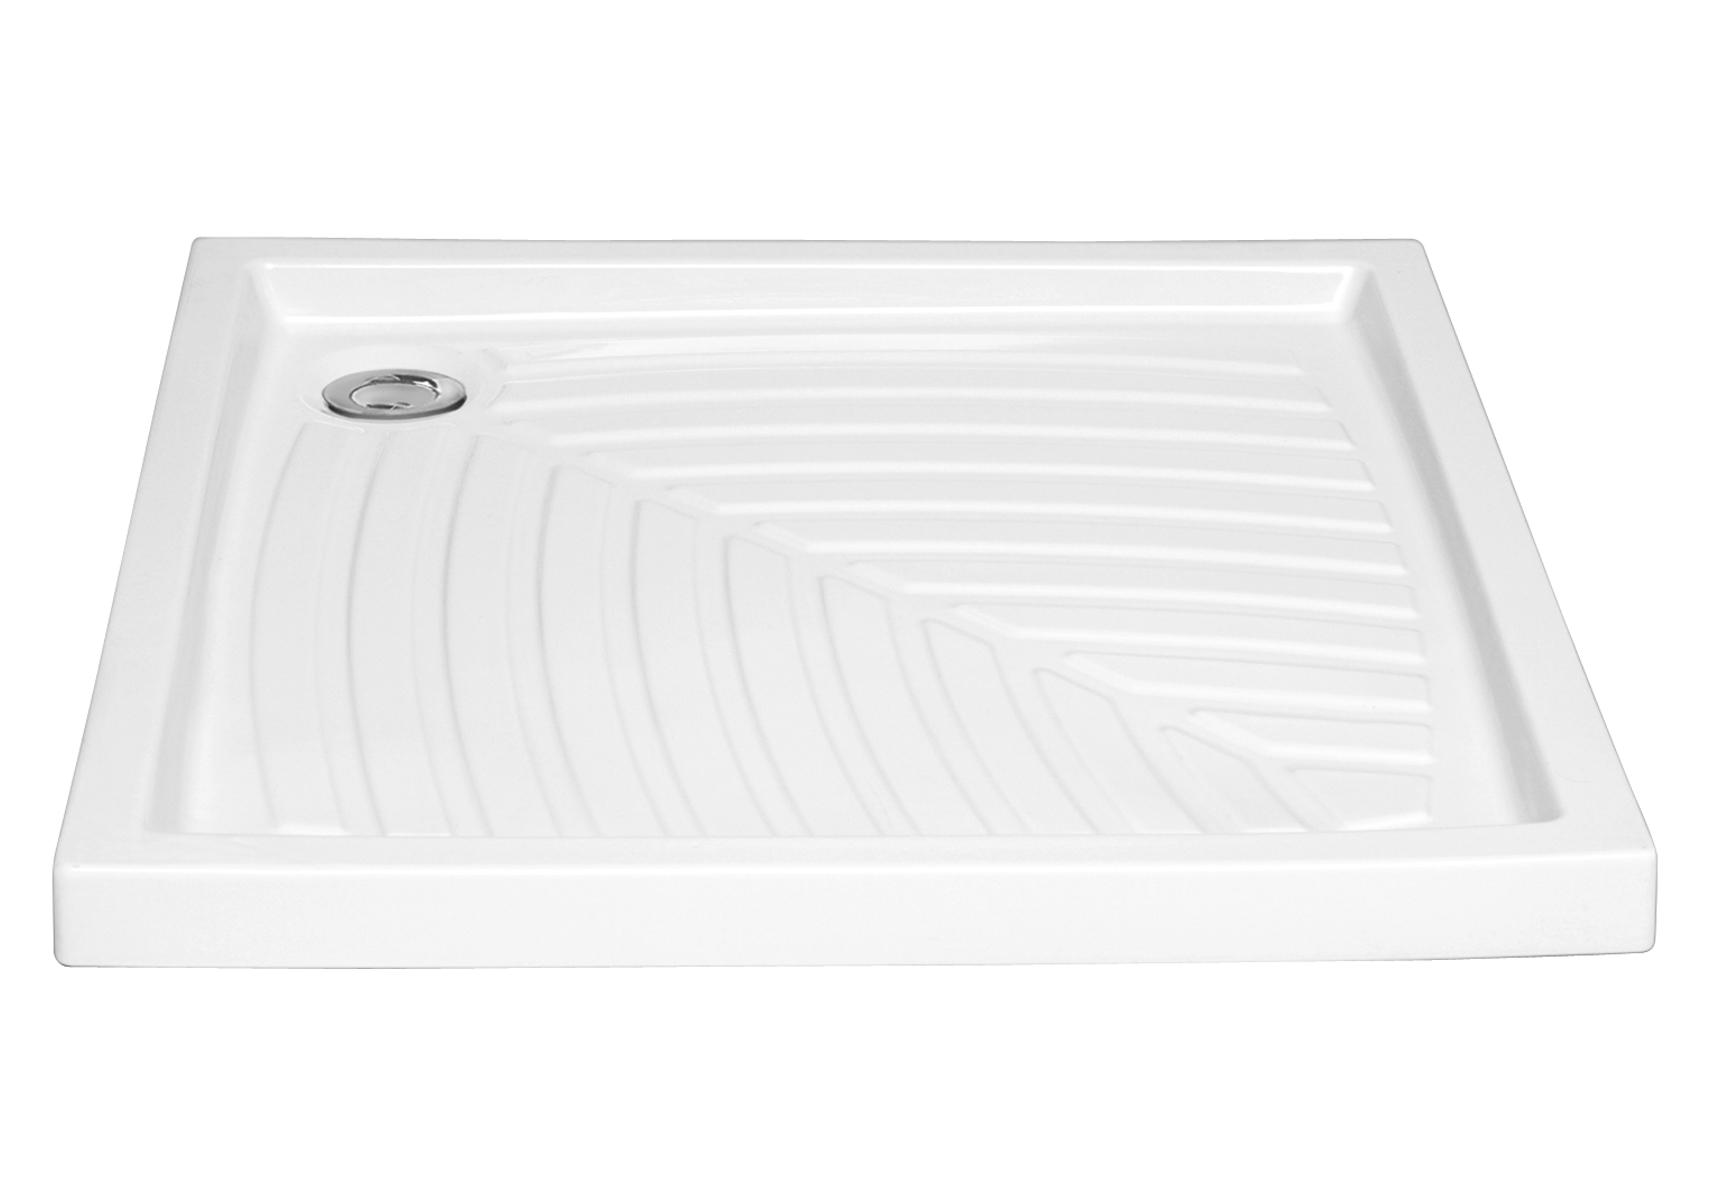 Arkitekt receveur à encastrer ou à poser fond extra plat, VitrA Antislip, 90  x  90 cm, blanc